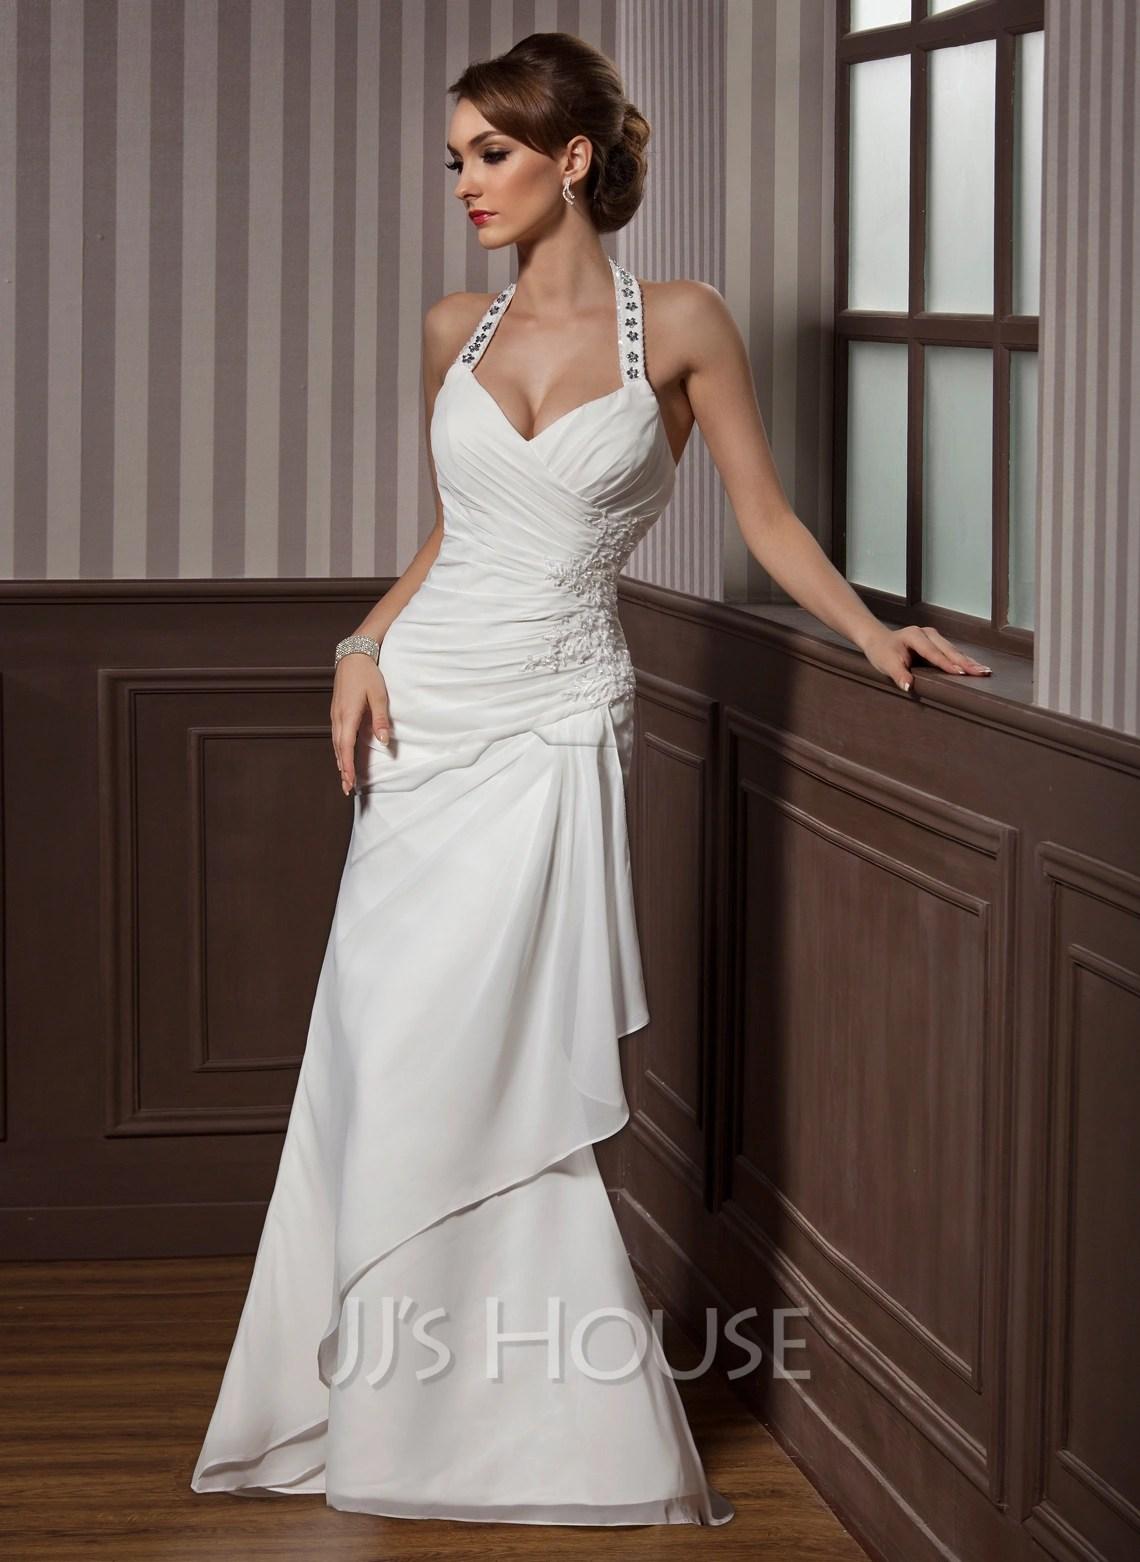 Sheath Column Halter Floor Length Chiffon Satin Wedding Dress With Beading Appliques Lace Sequins Cascading Ruffles g jjshouse wedding dress Home Wedding Dresses Loading zoom